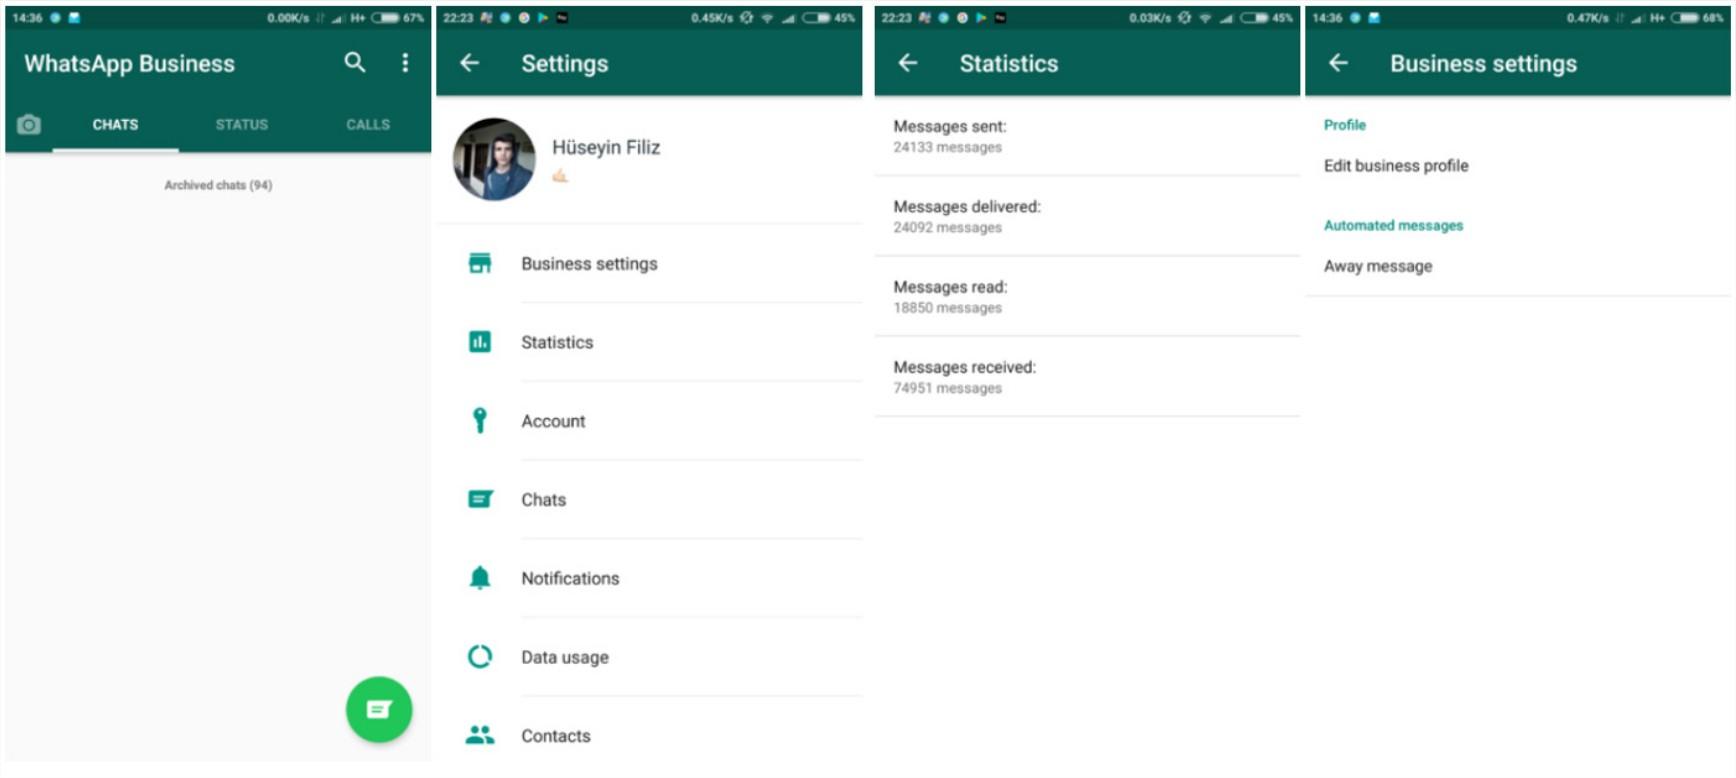 Whatsapp Business 4 Verwachte Ontwikkelingen Frankwatching